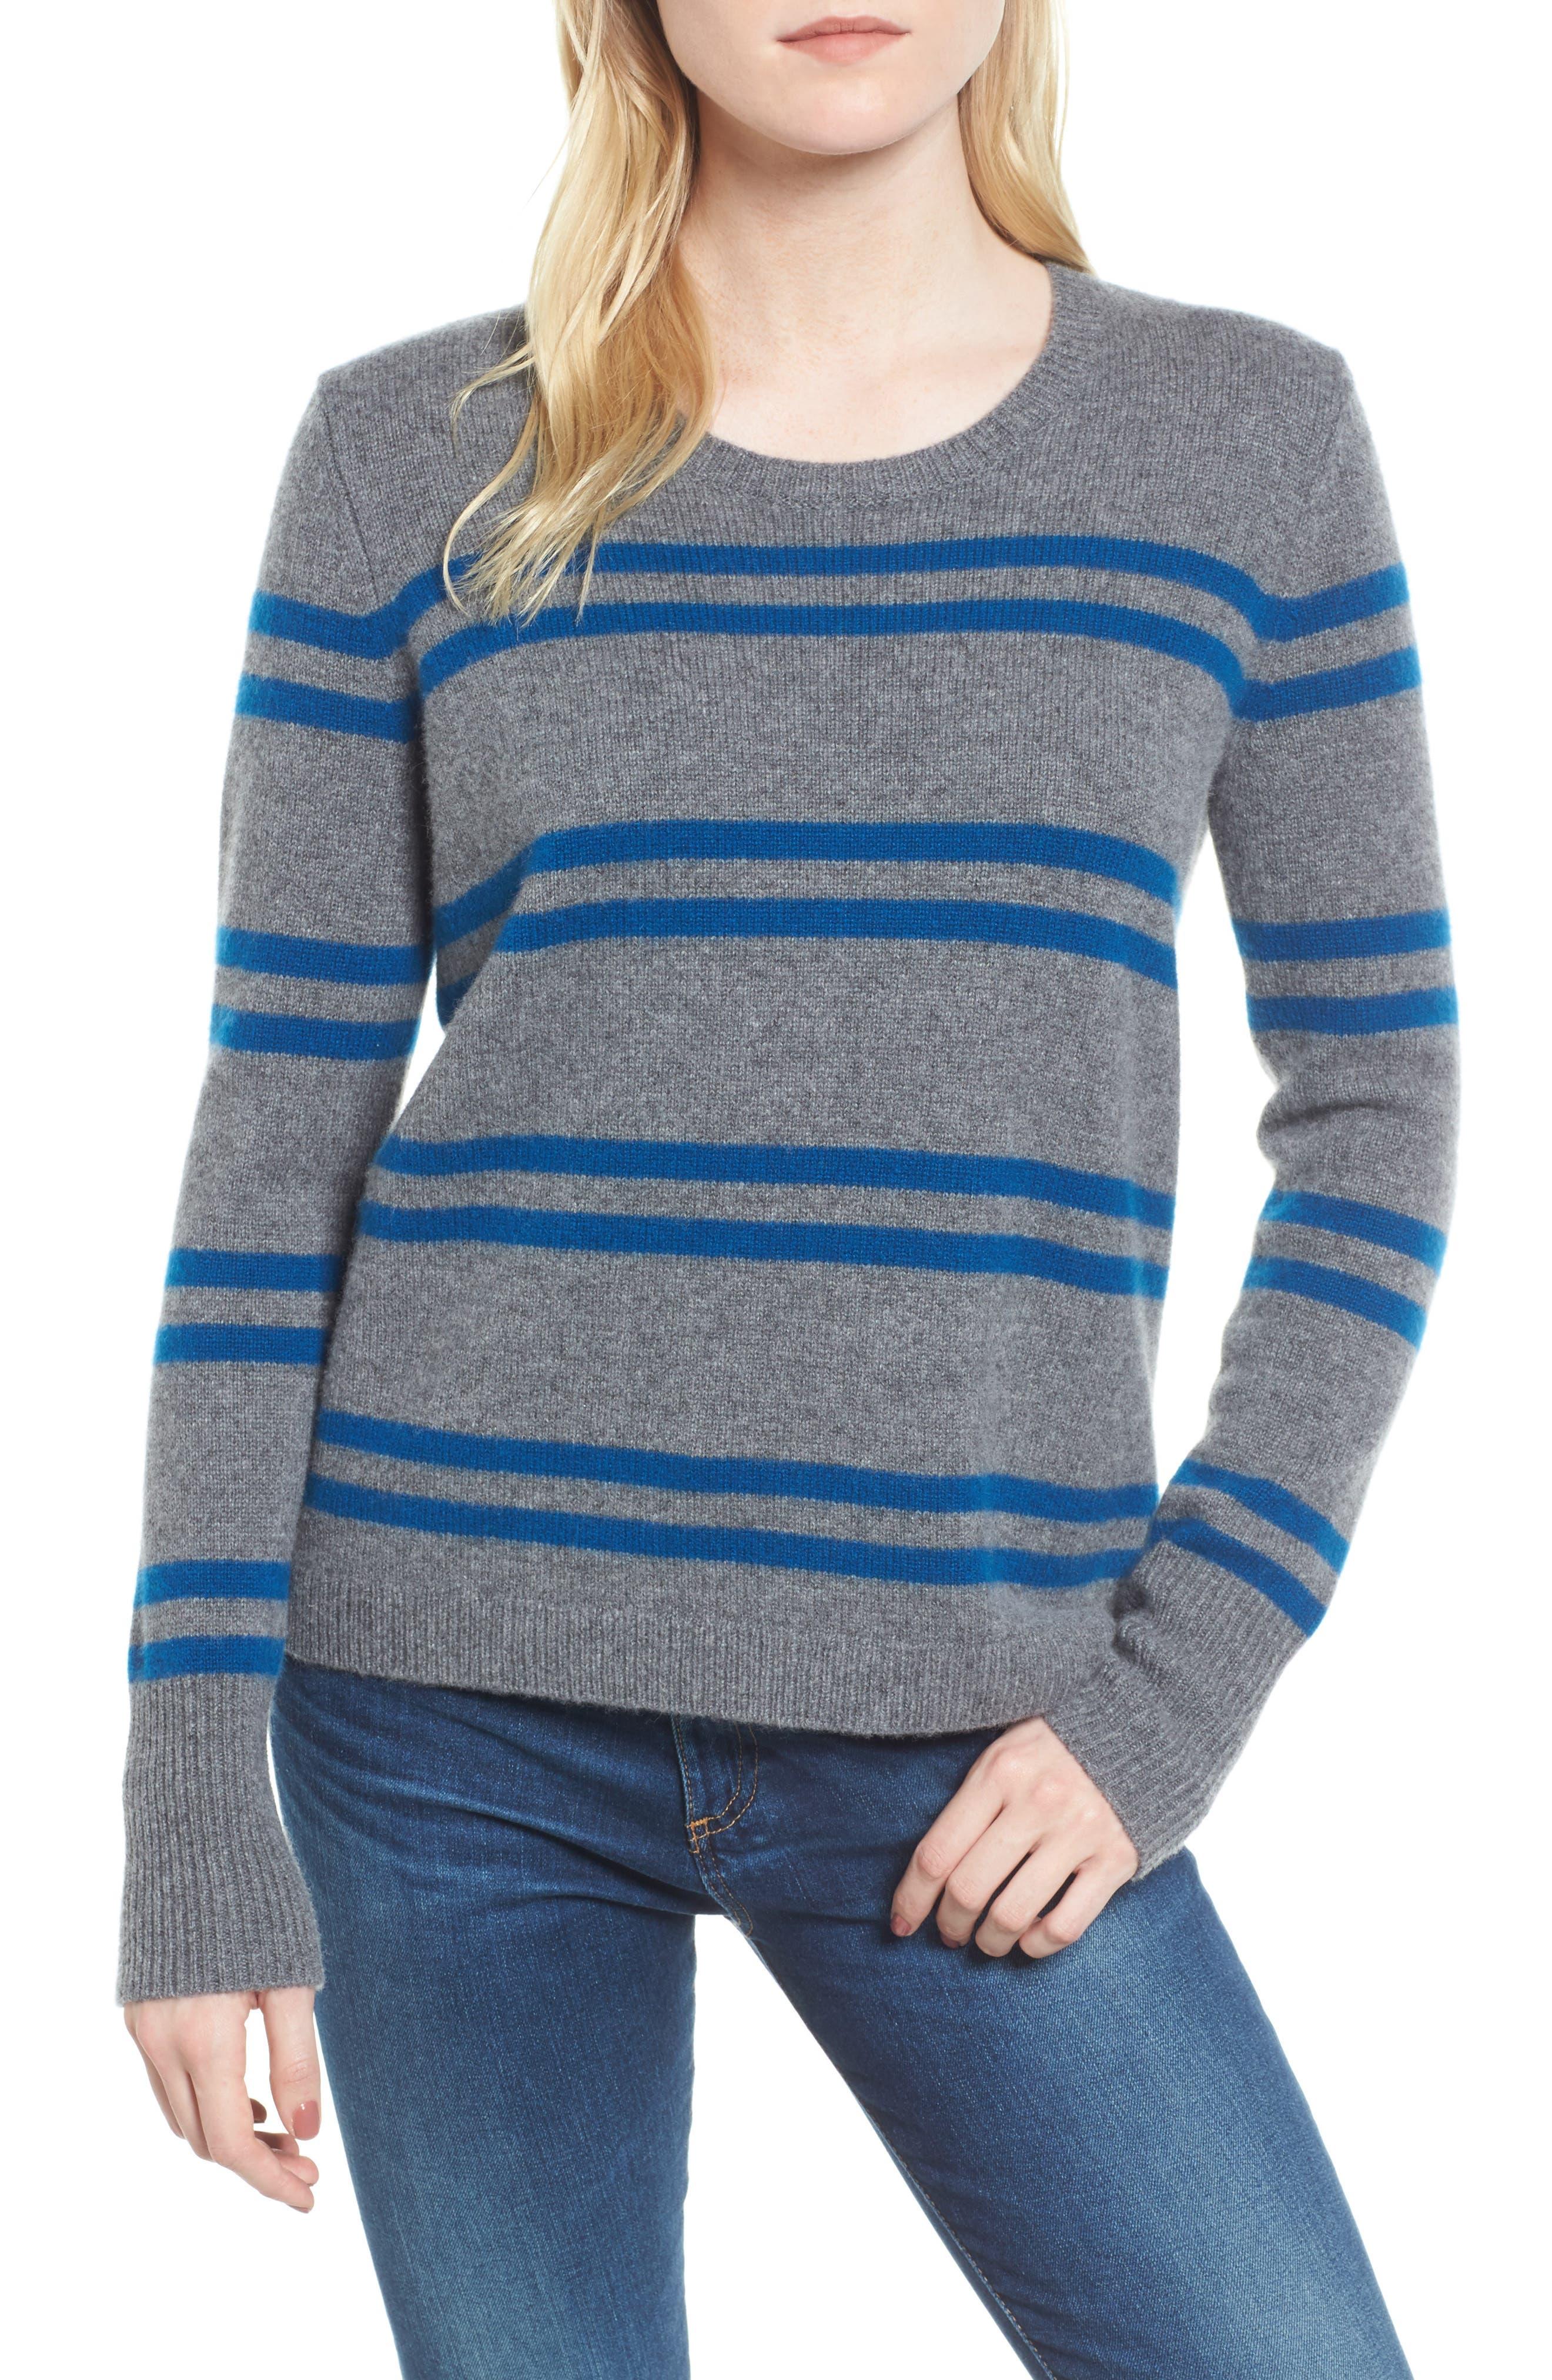 Main Image - James Perse Stripe Cashmere Sweatshirt